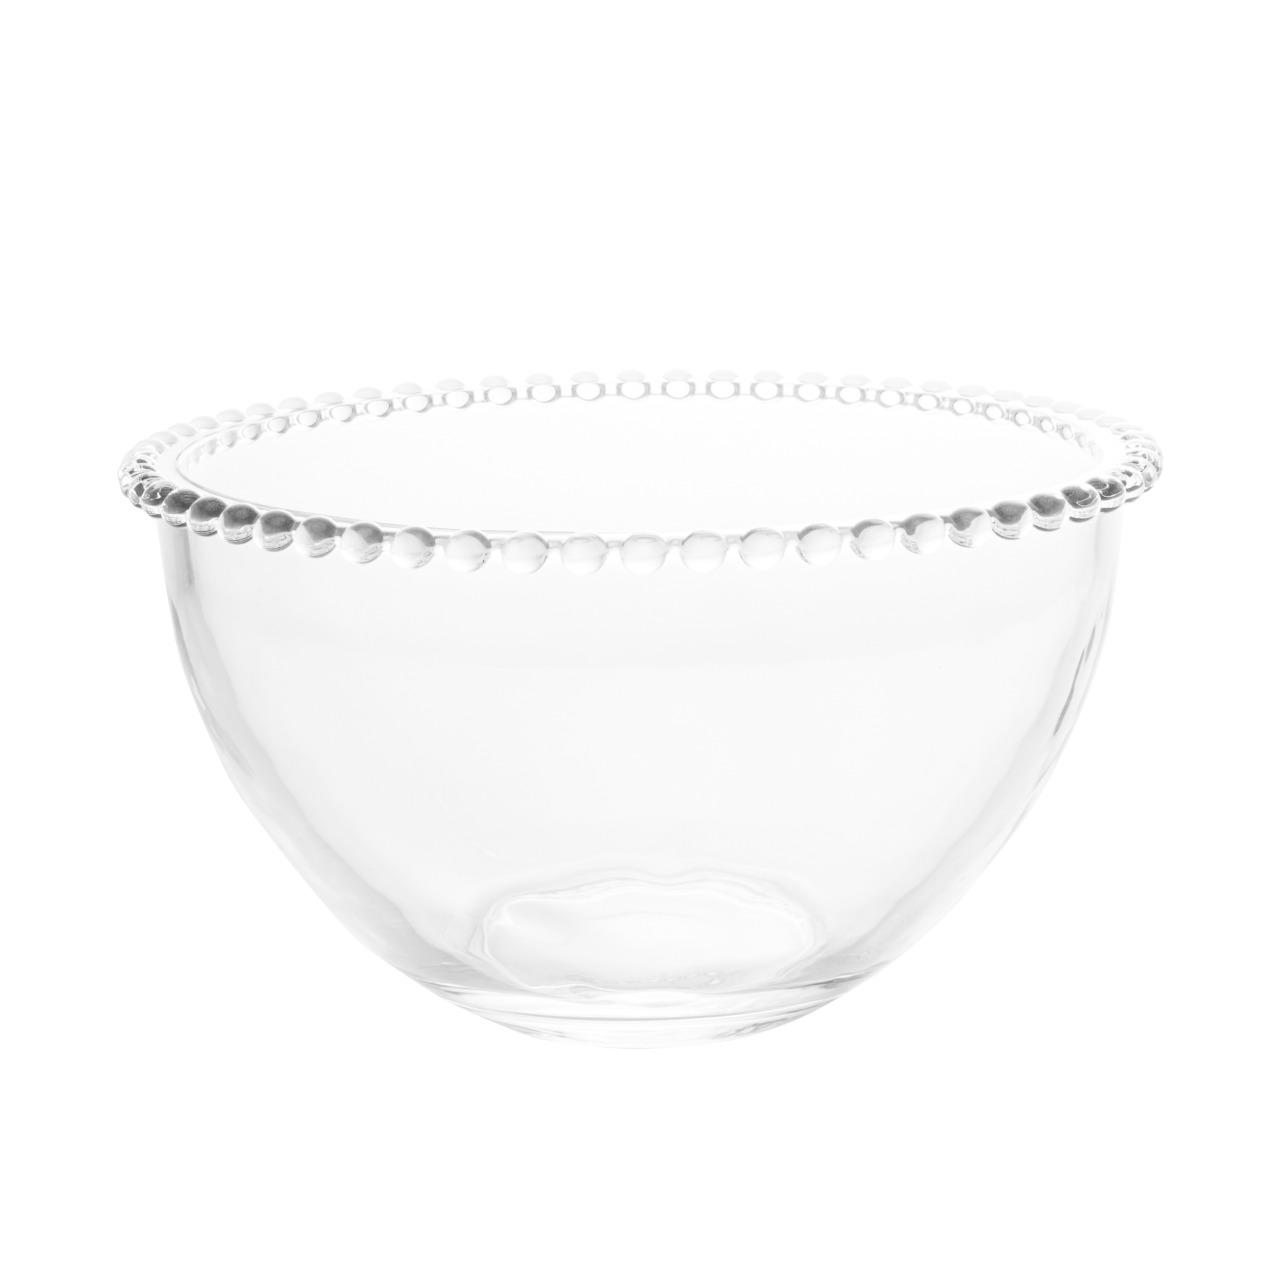 Saladeira Cristal Pearl 21x12cm - Wolff